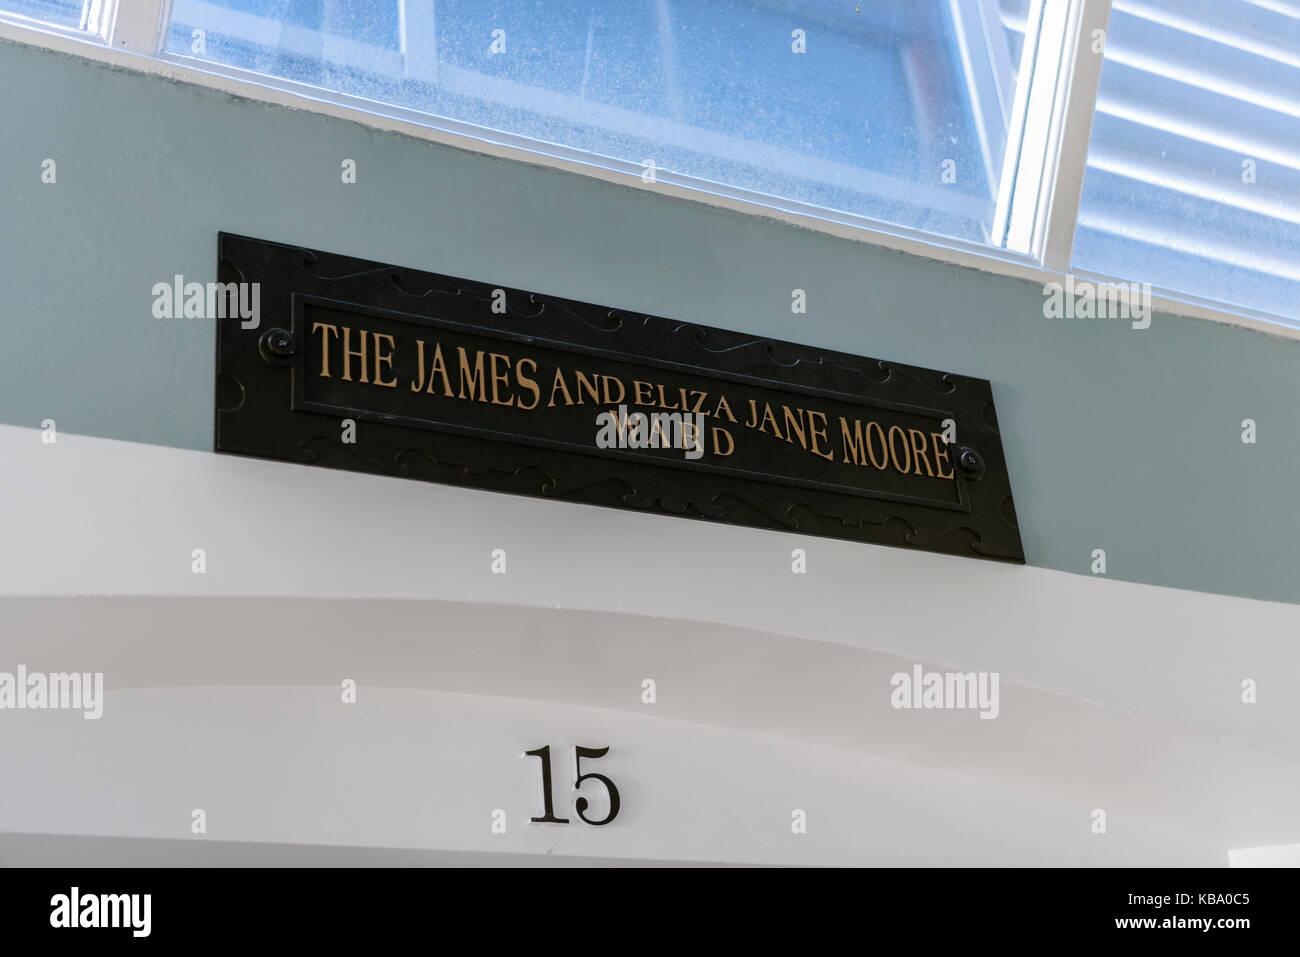 Ward 15 (The James and Eliza Jane Moor Ward) at the oldVictorian corridor, Royal Victoria Hospital, Belfast. - Stock Image